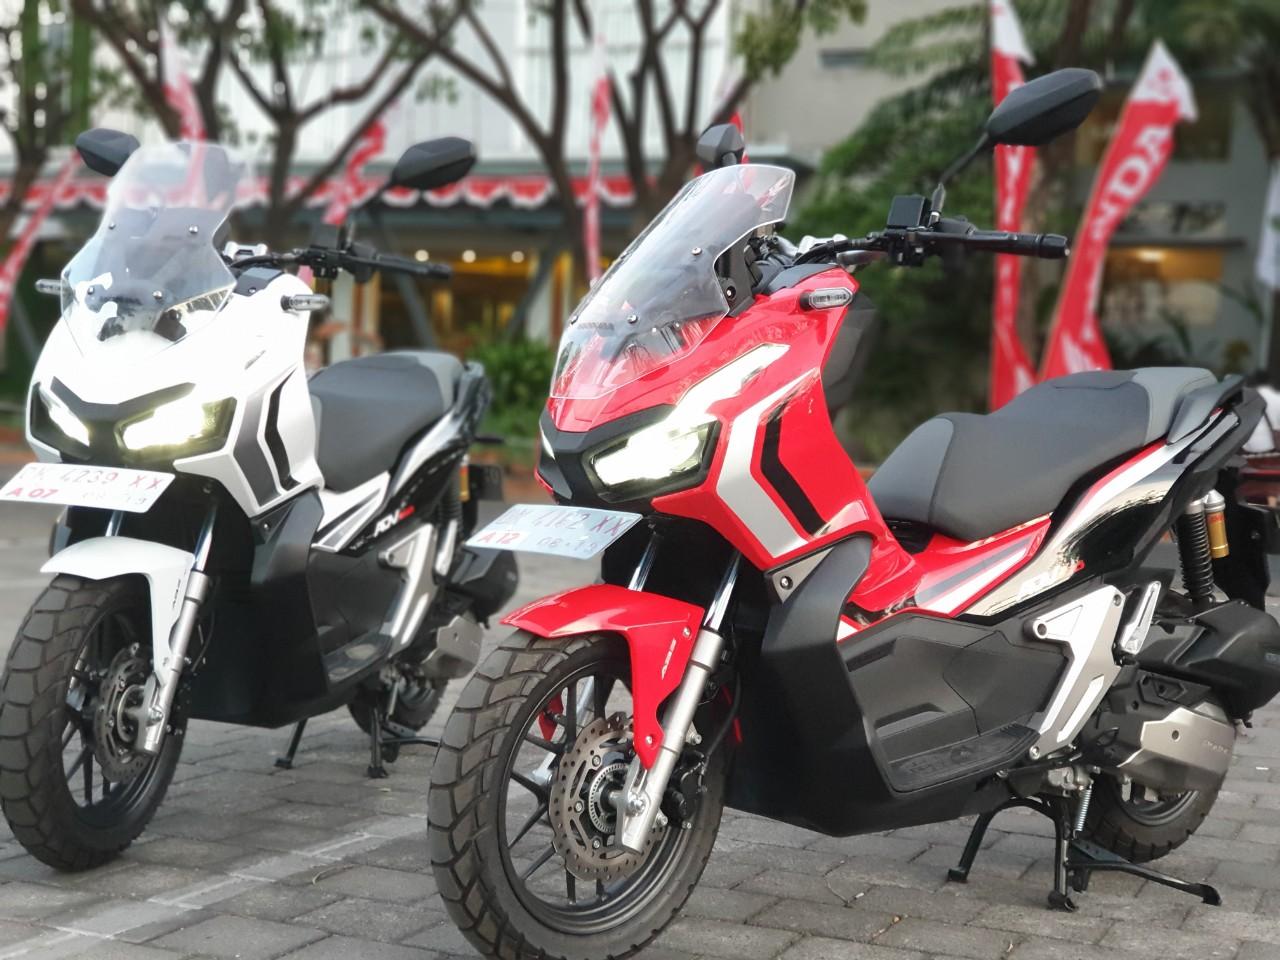 5 Pembeda Honda Adv 150 Tipe Abs Dan Cbs